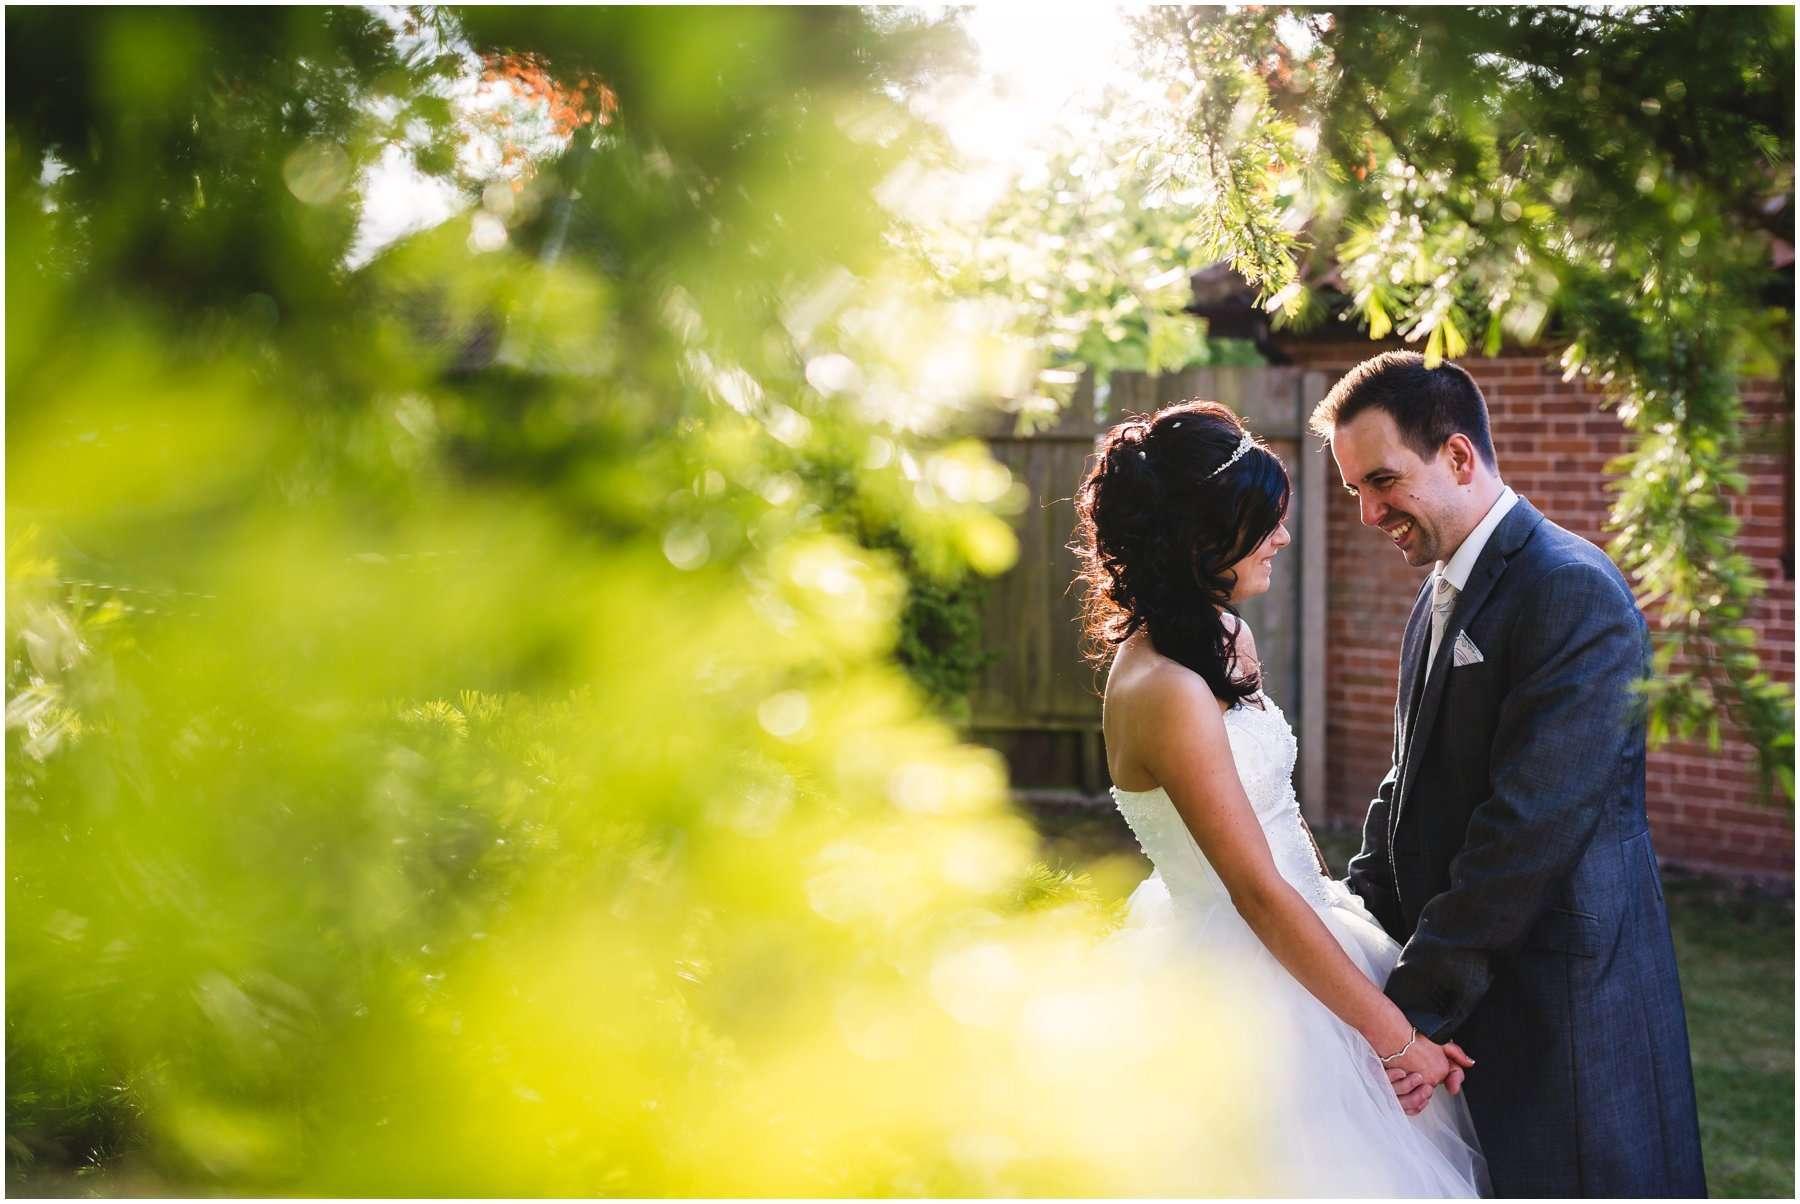 Andy Davison - Brasted's Wedding Photographer